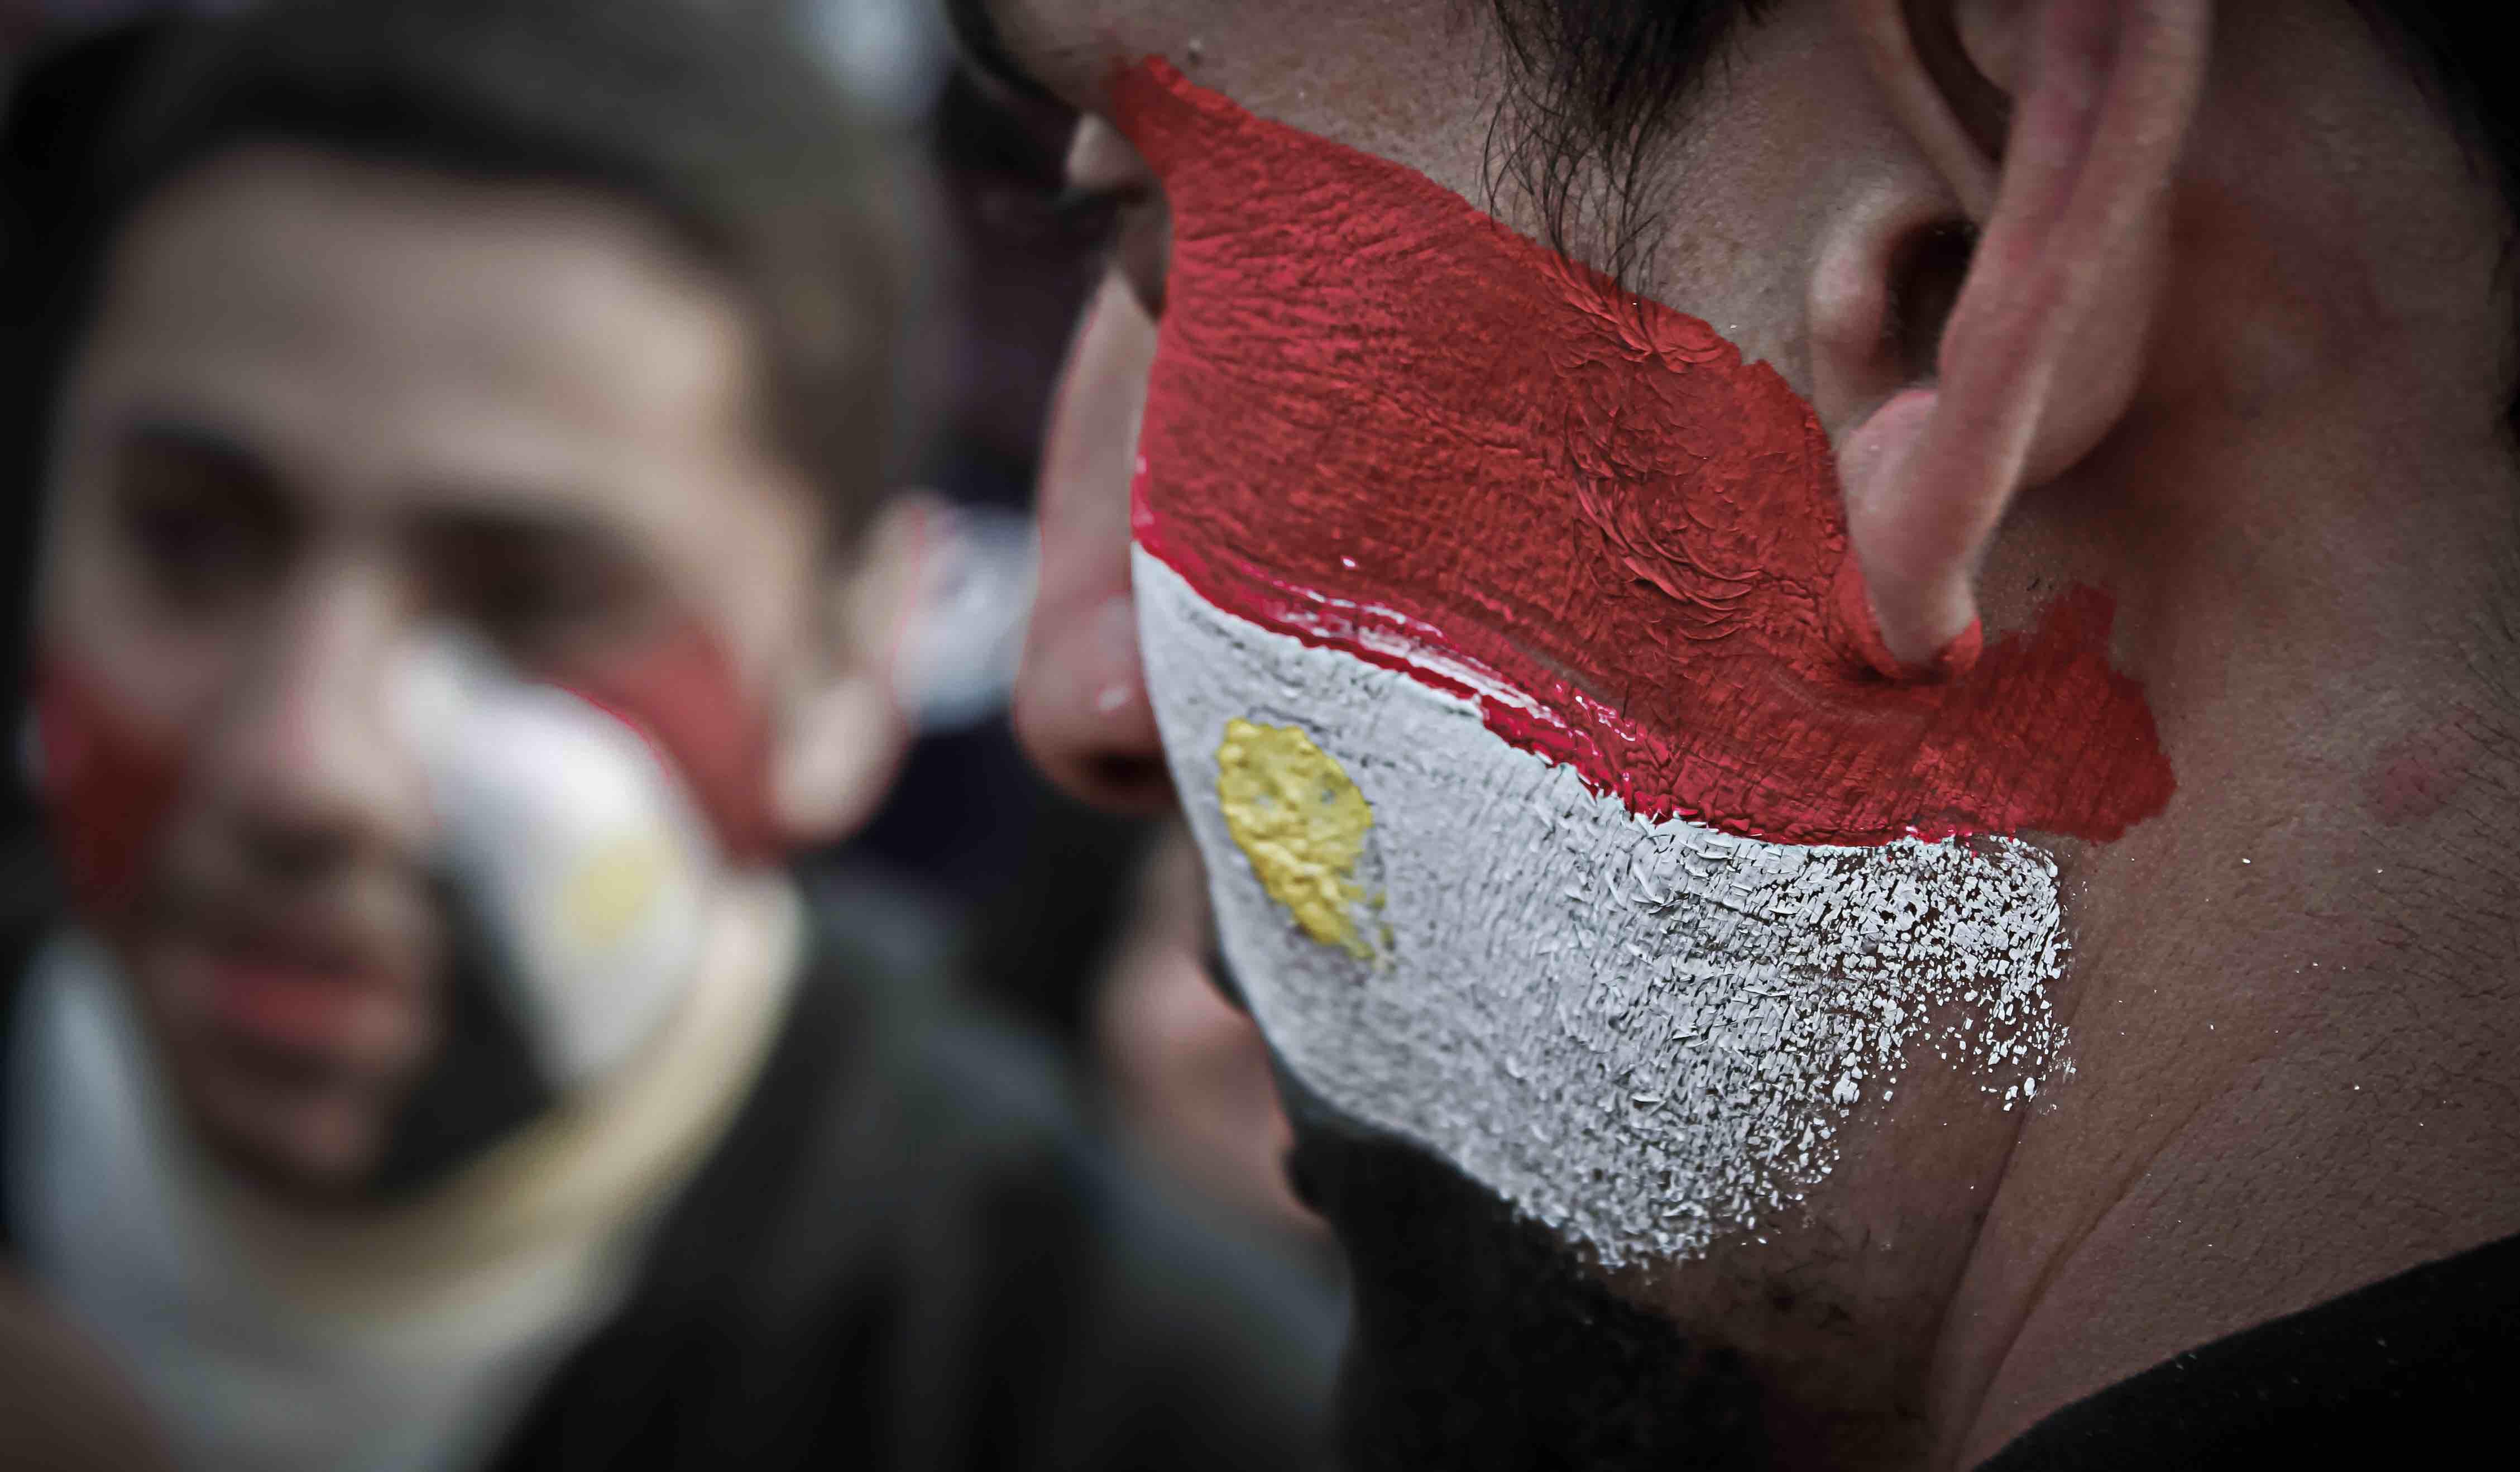 Rallies in Tahrir Square, Cairo, 2011 (Photo: Ahmad Hammoud/Flickr)